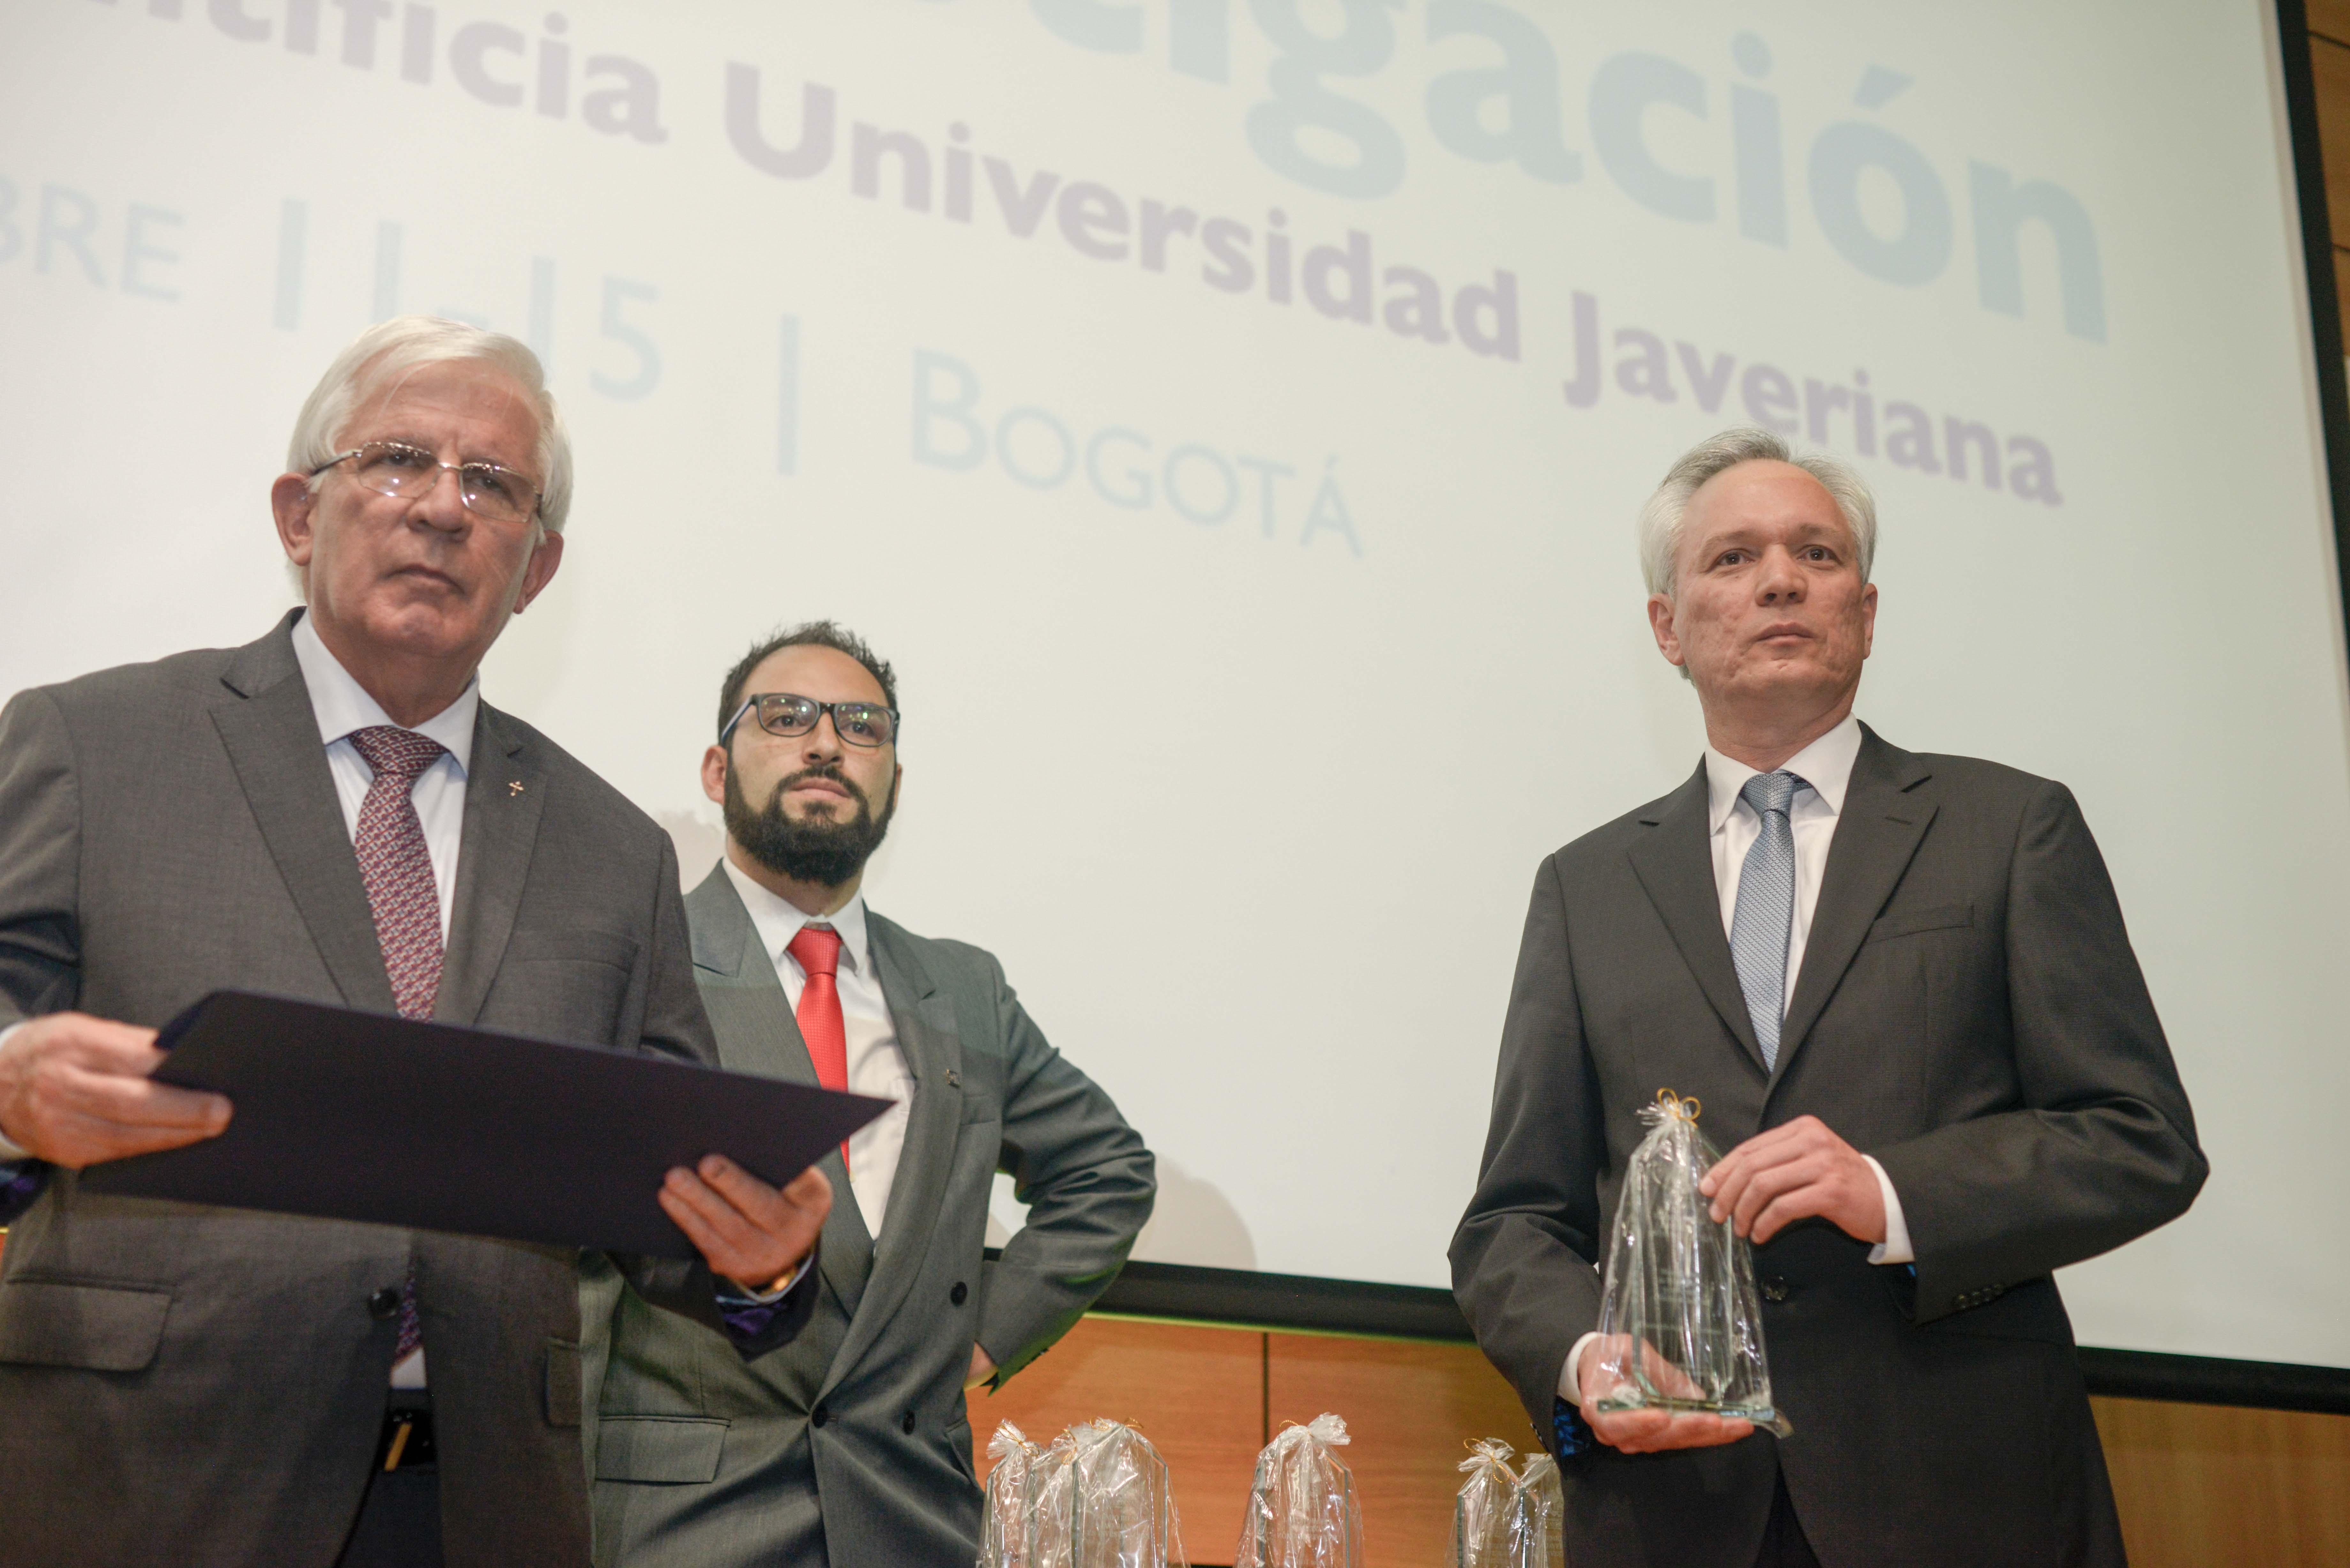 La Javeriana premia a sus investigadores